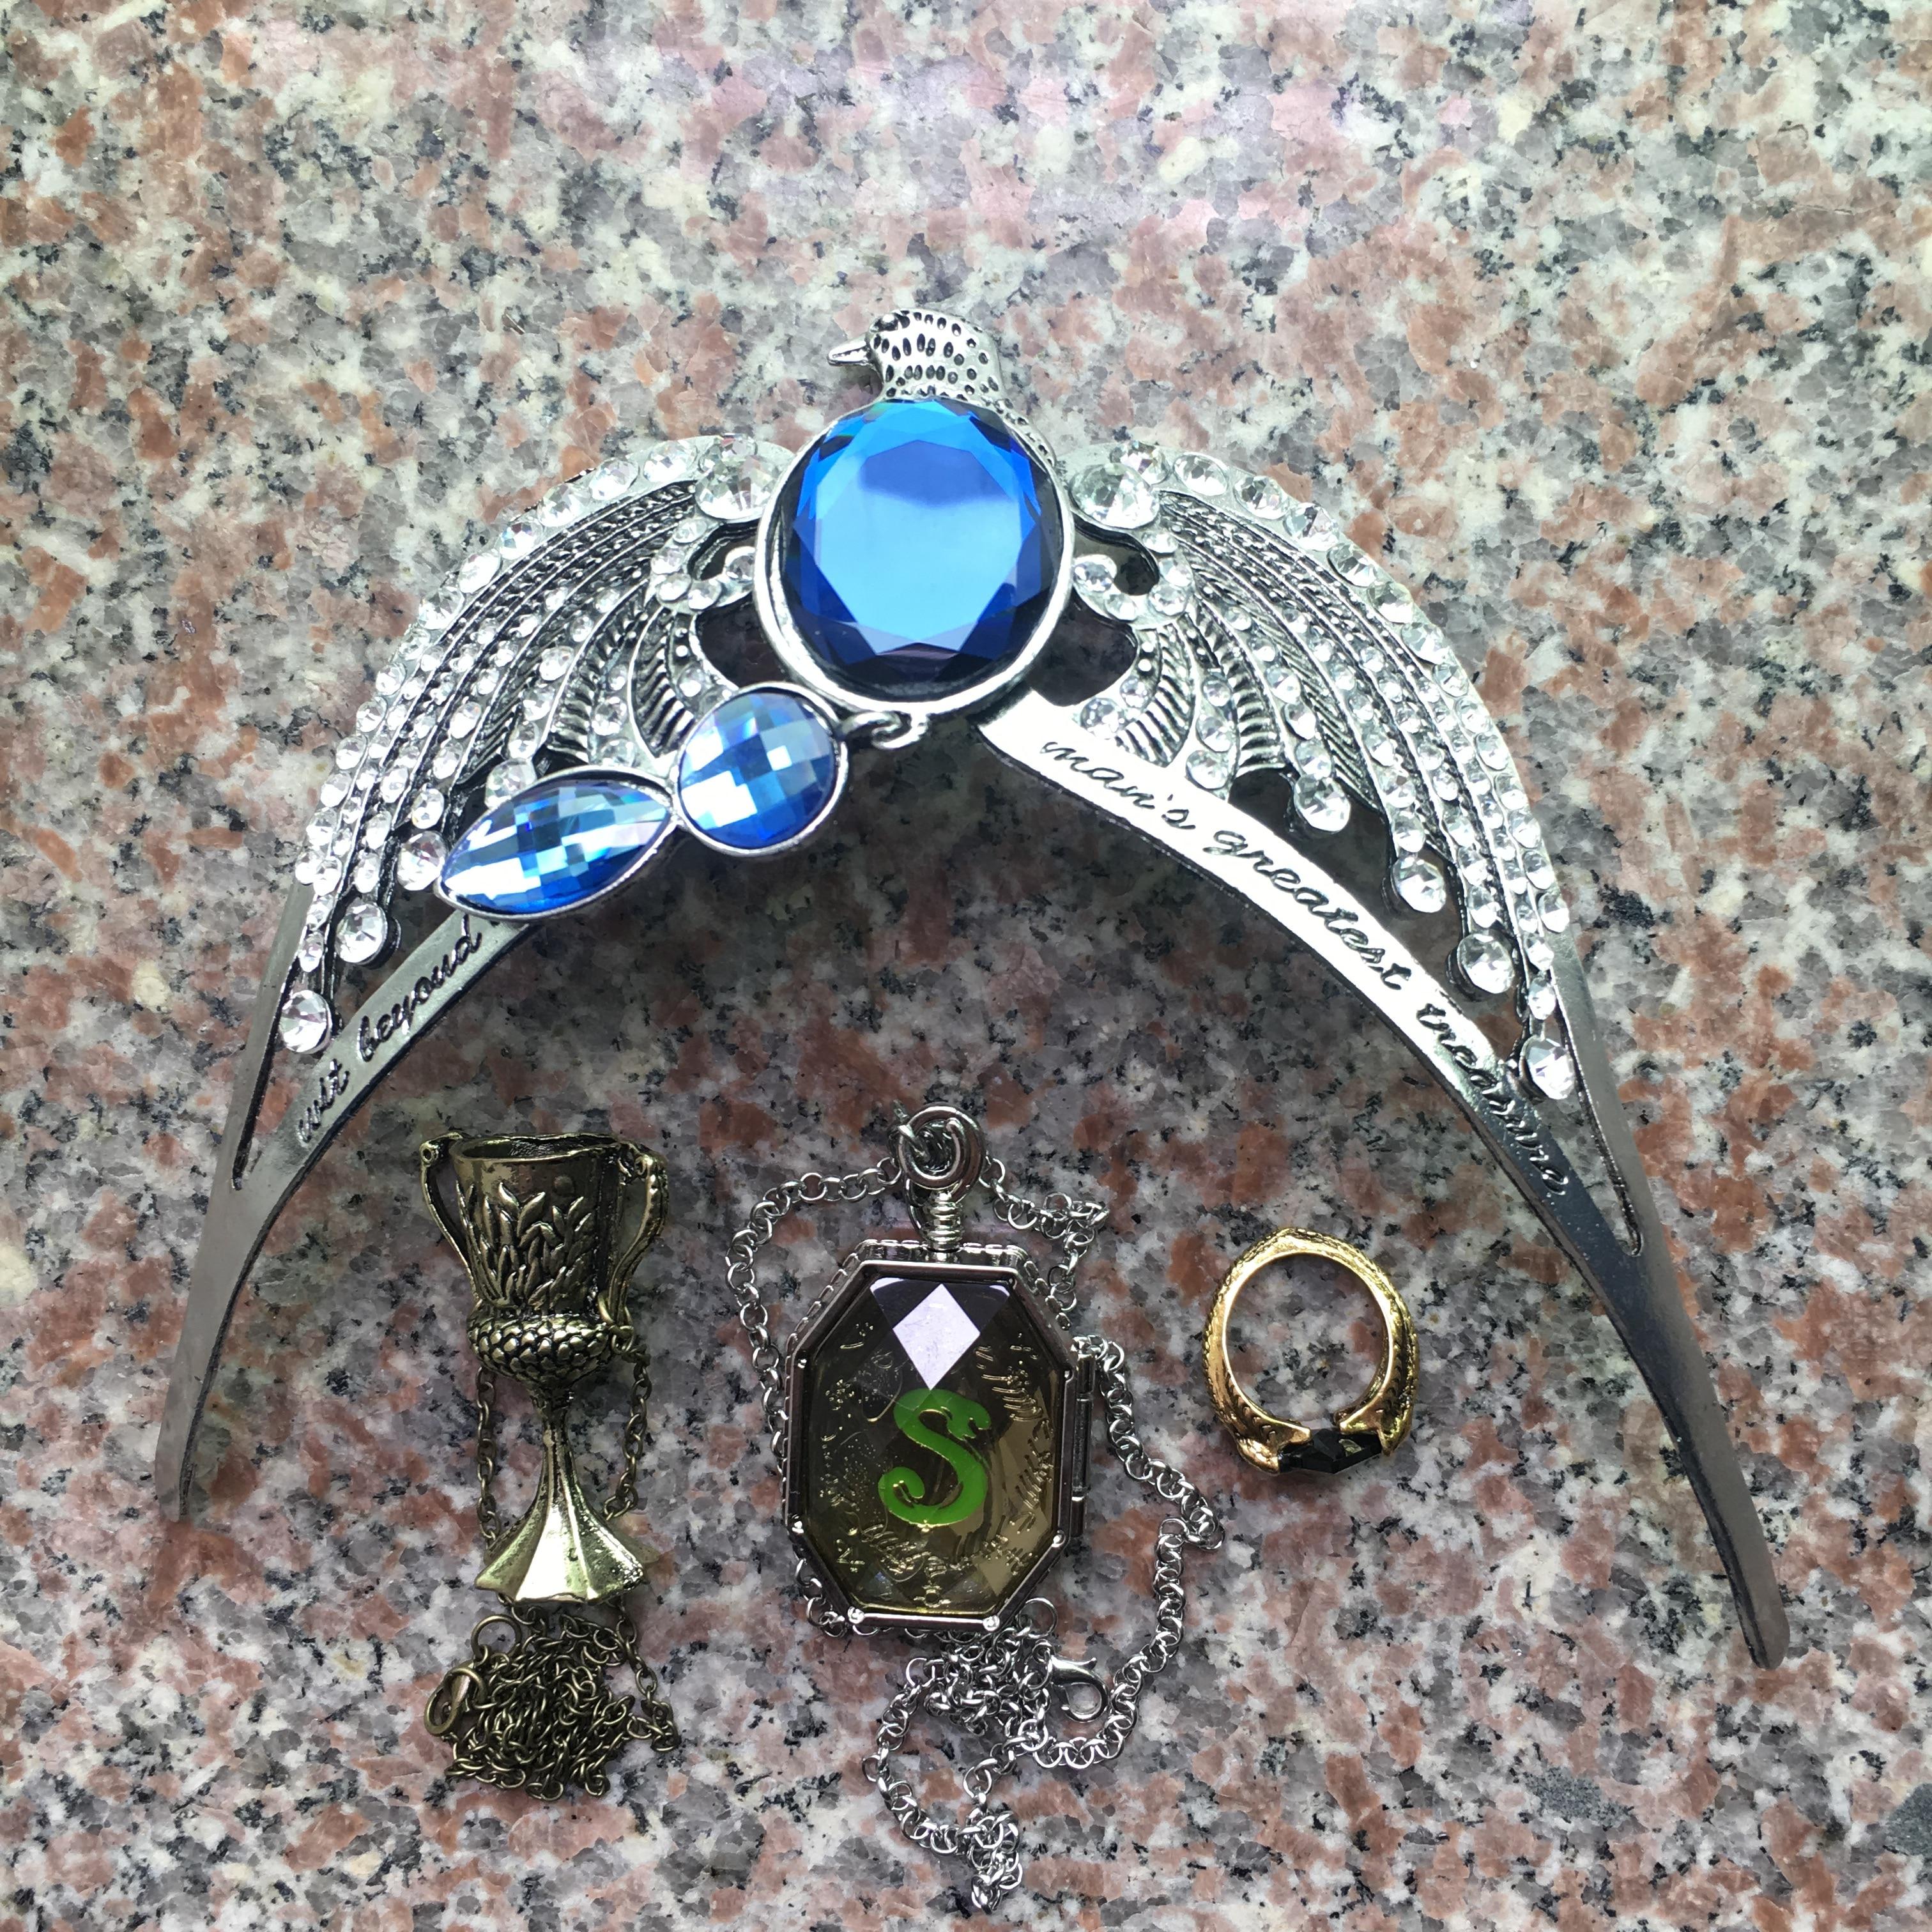 Big Marvolo Gaunt Ring Salazar Slytherin Locket Hufflepuff's Goblet Diadem Of Ravenclaw Voldemort Horcrux 4pcs Set Costume Props